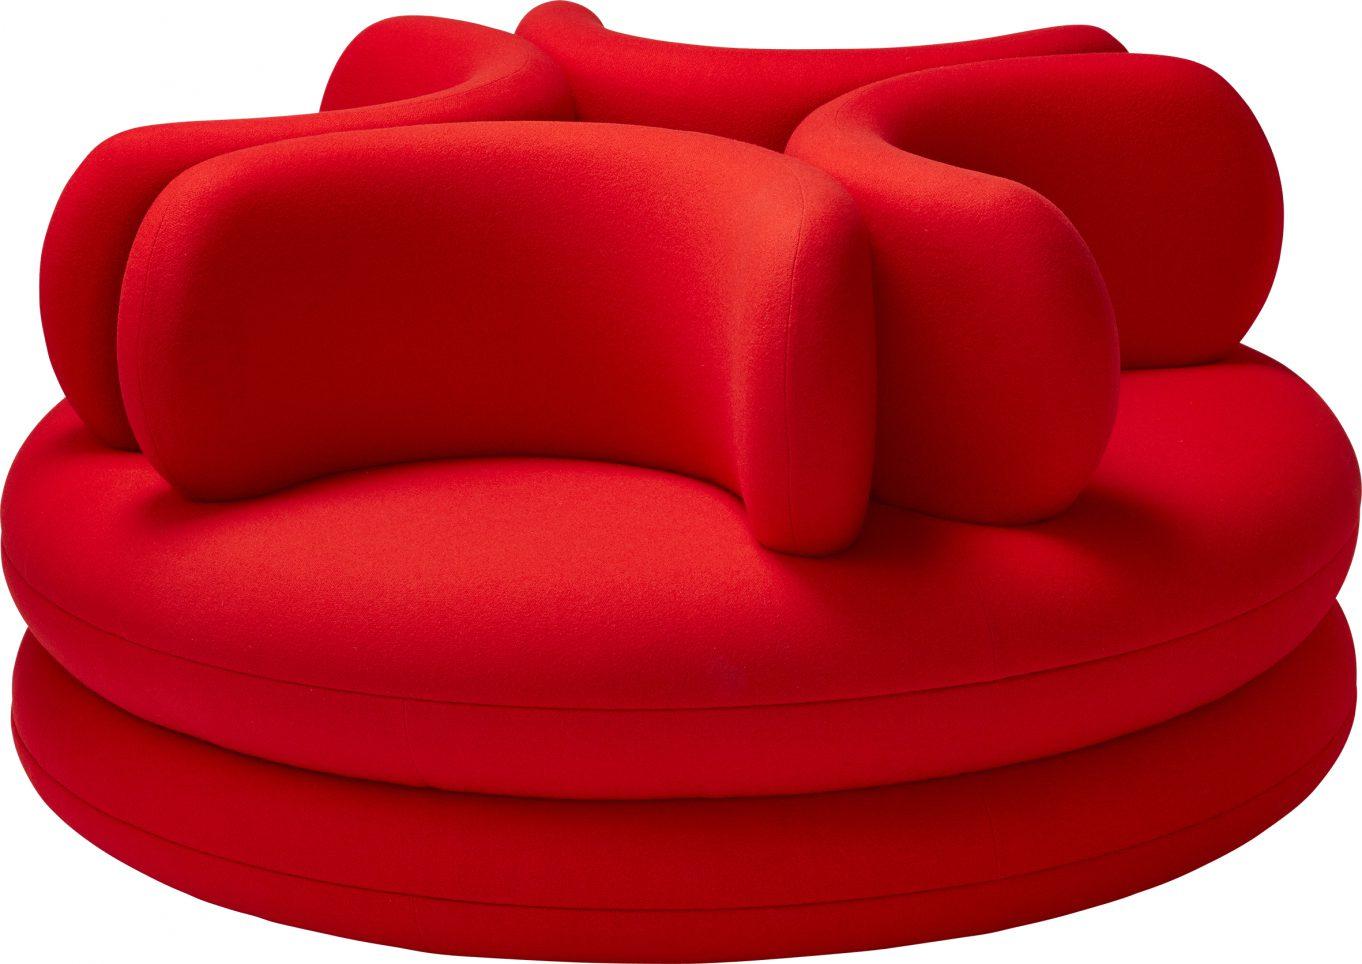 Easy Sofa by Verpan